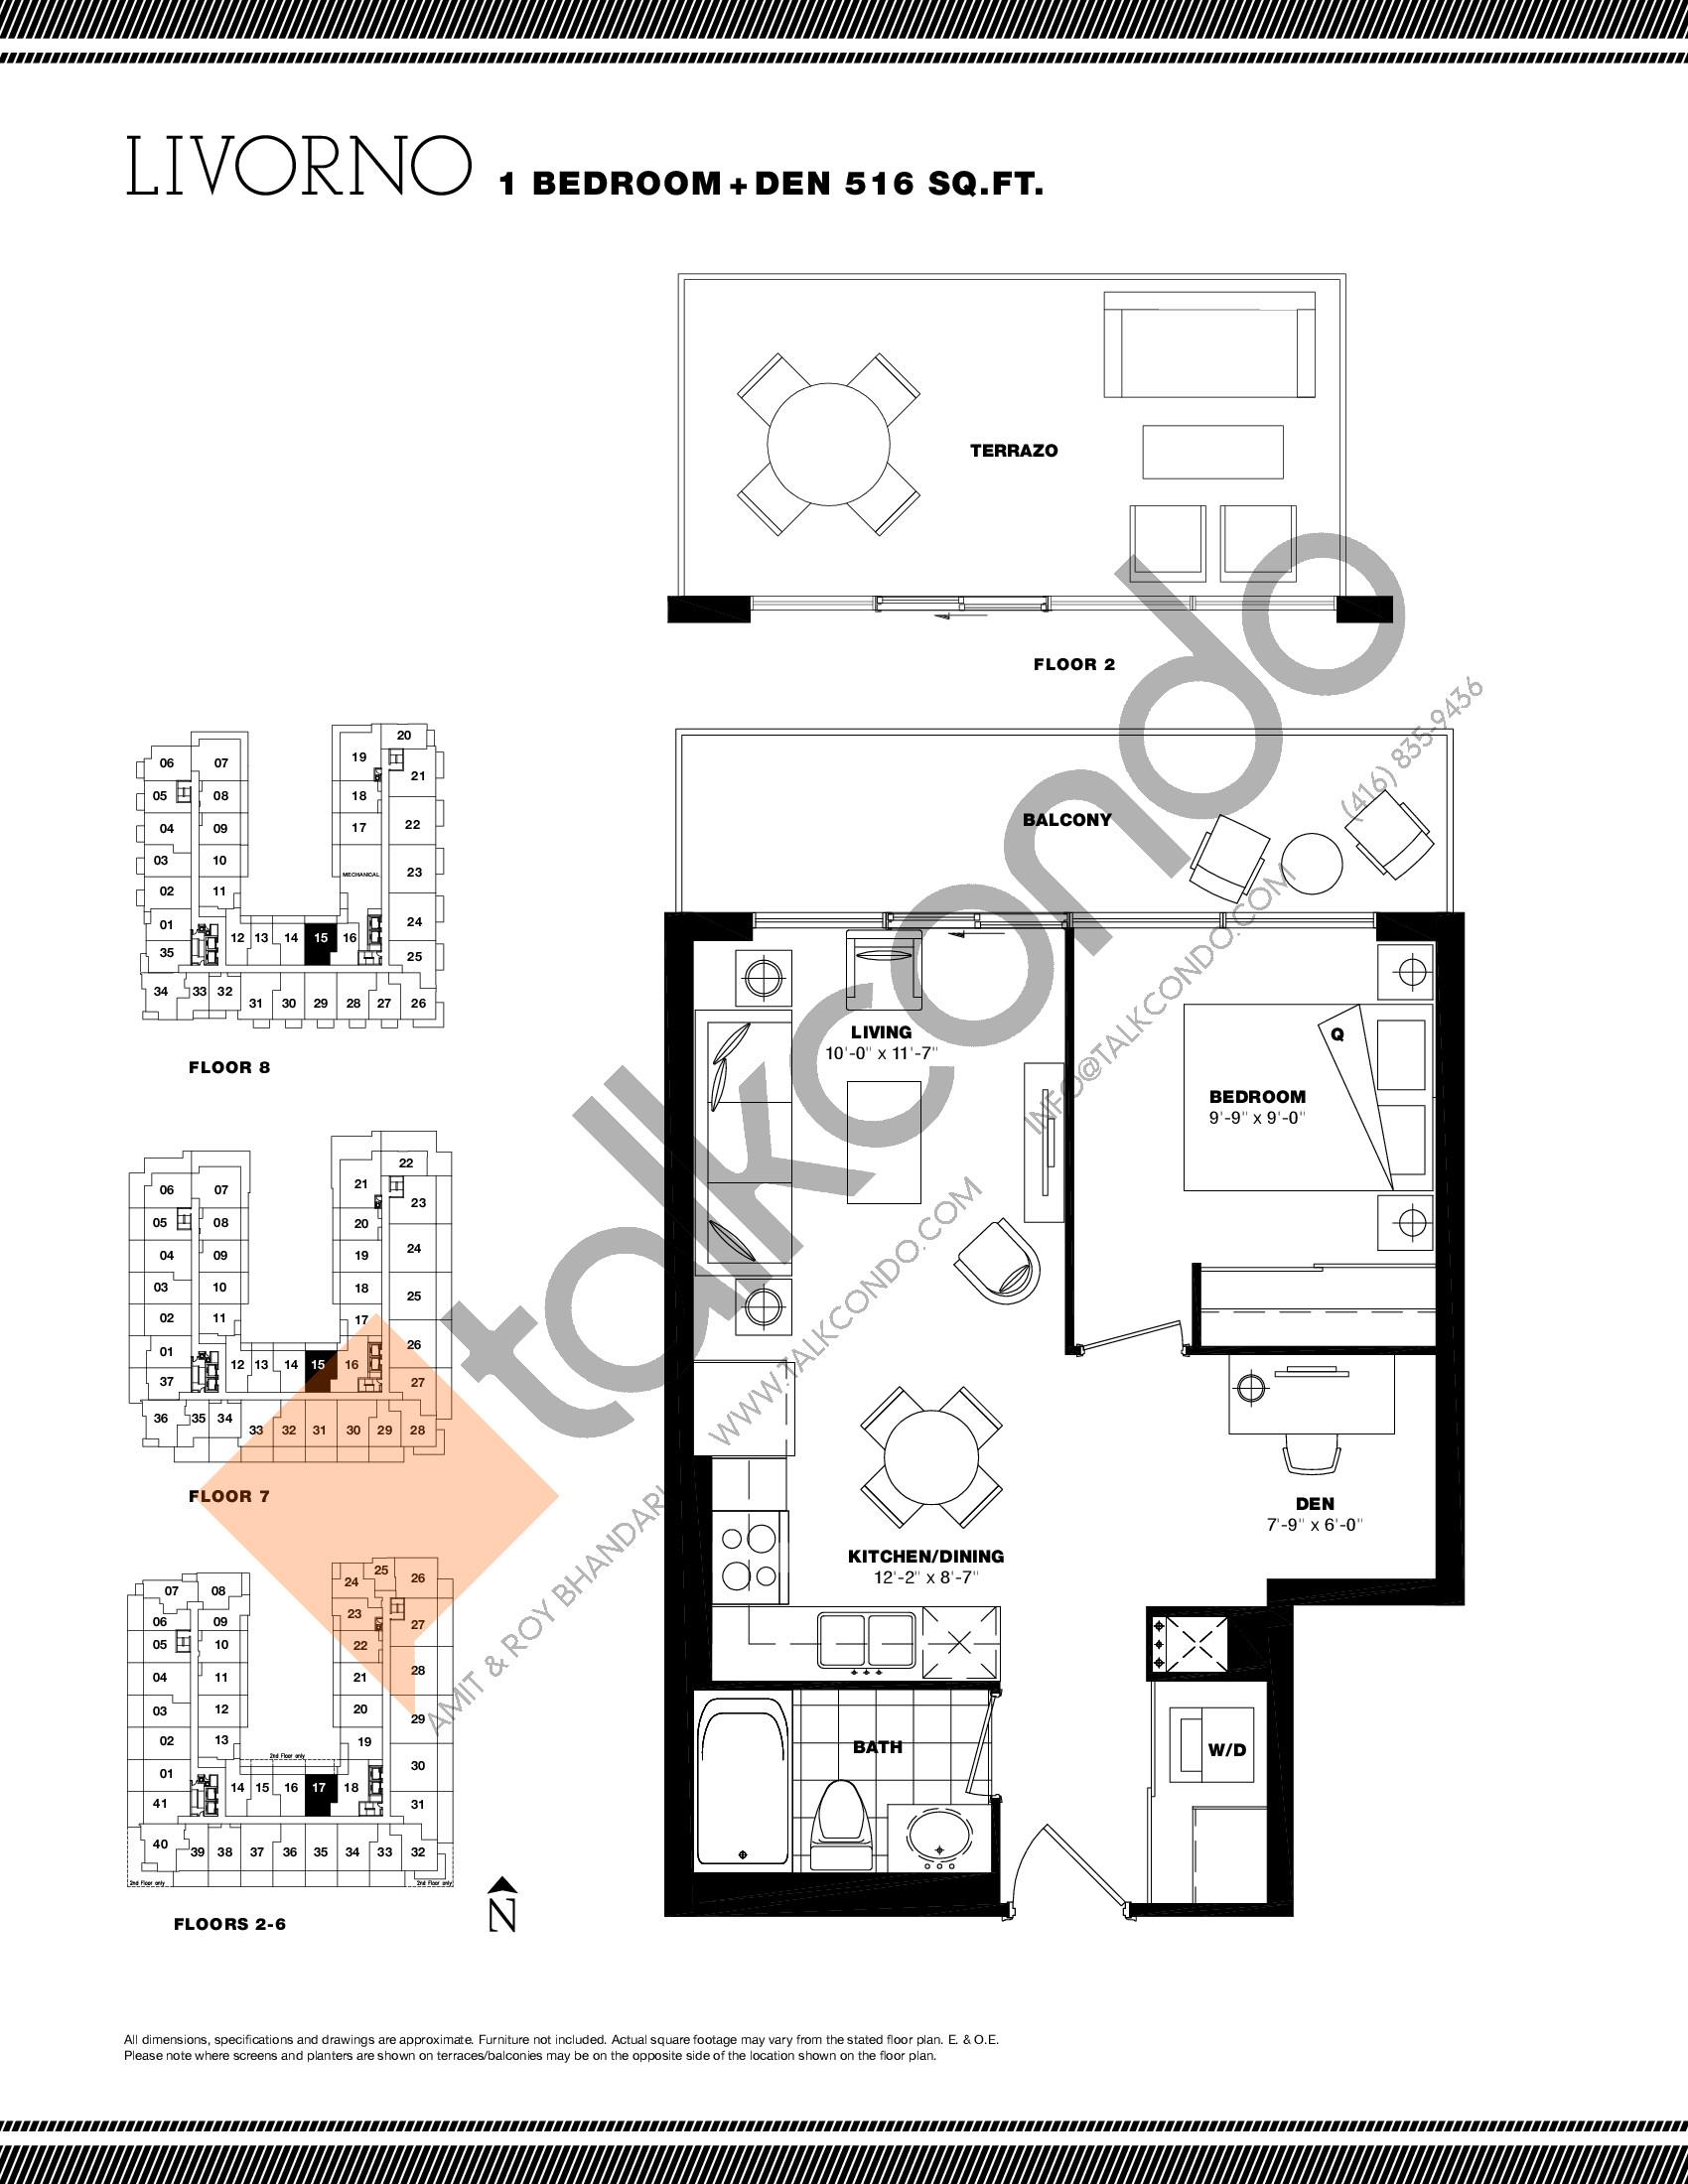 Livorno Floor Plan at Residenze Palazzo at Treviso 3 Condos - 516 sq.ft